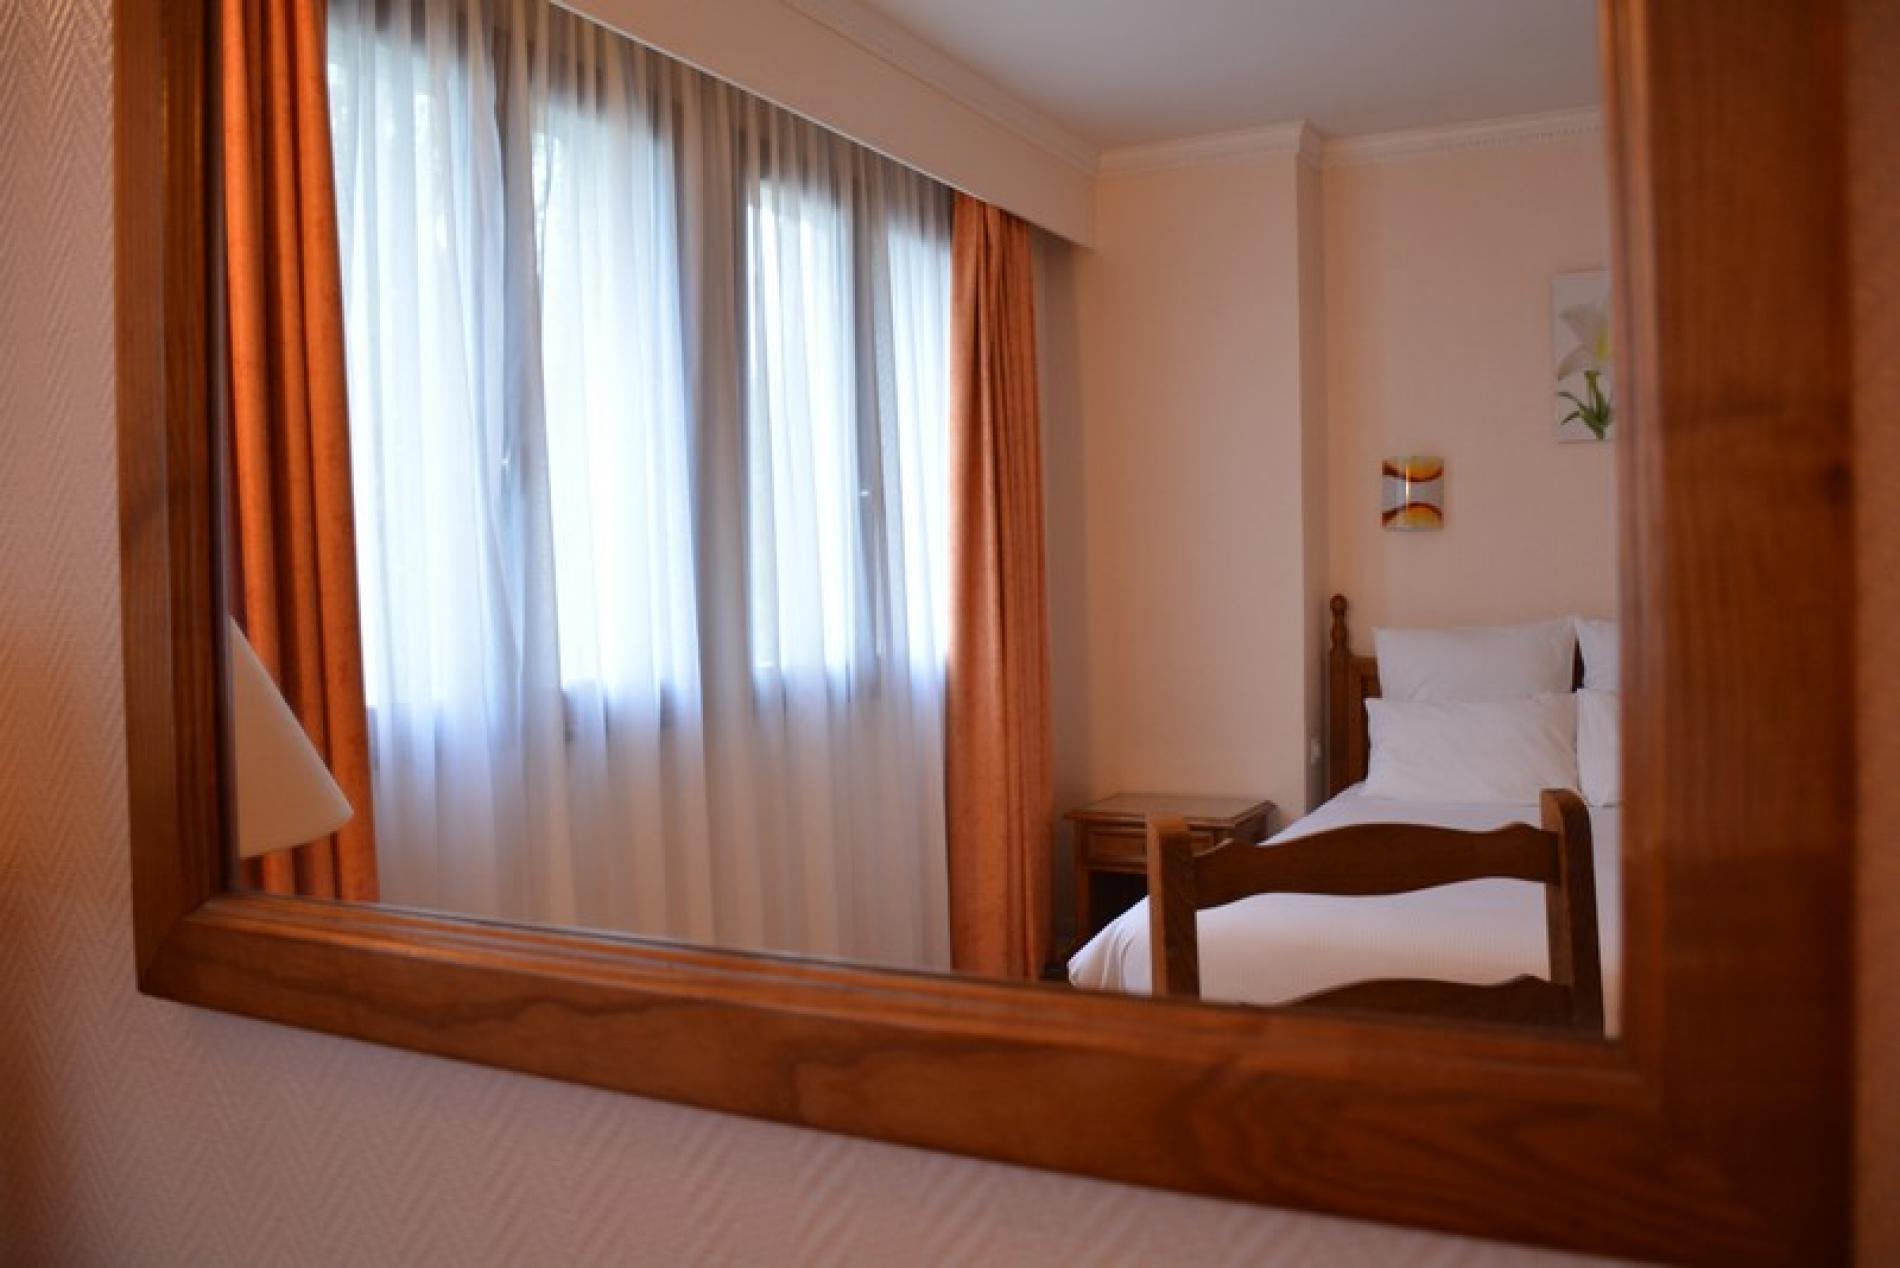 ∞ Hotel Deauville Avec Piscine - Hotel 3 Étoiles Deauville ... pour Horaires Piscine Deauville